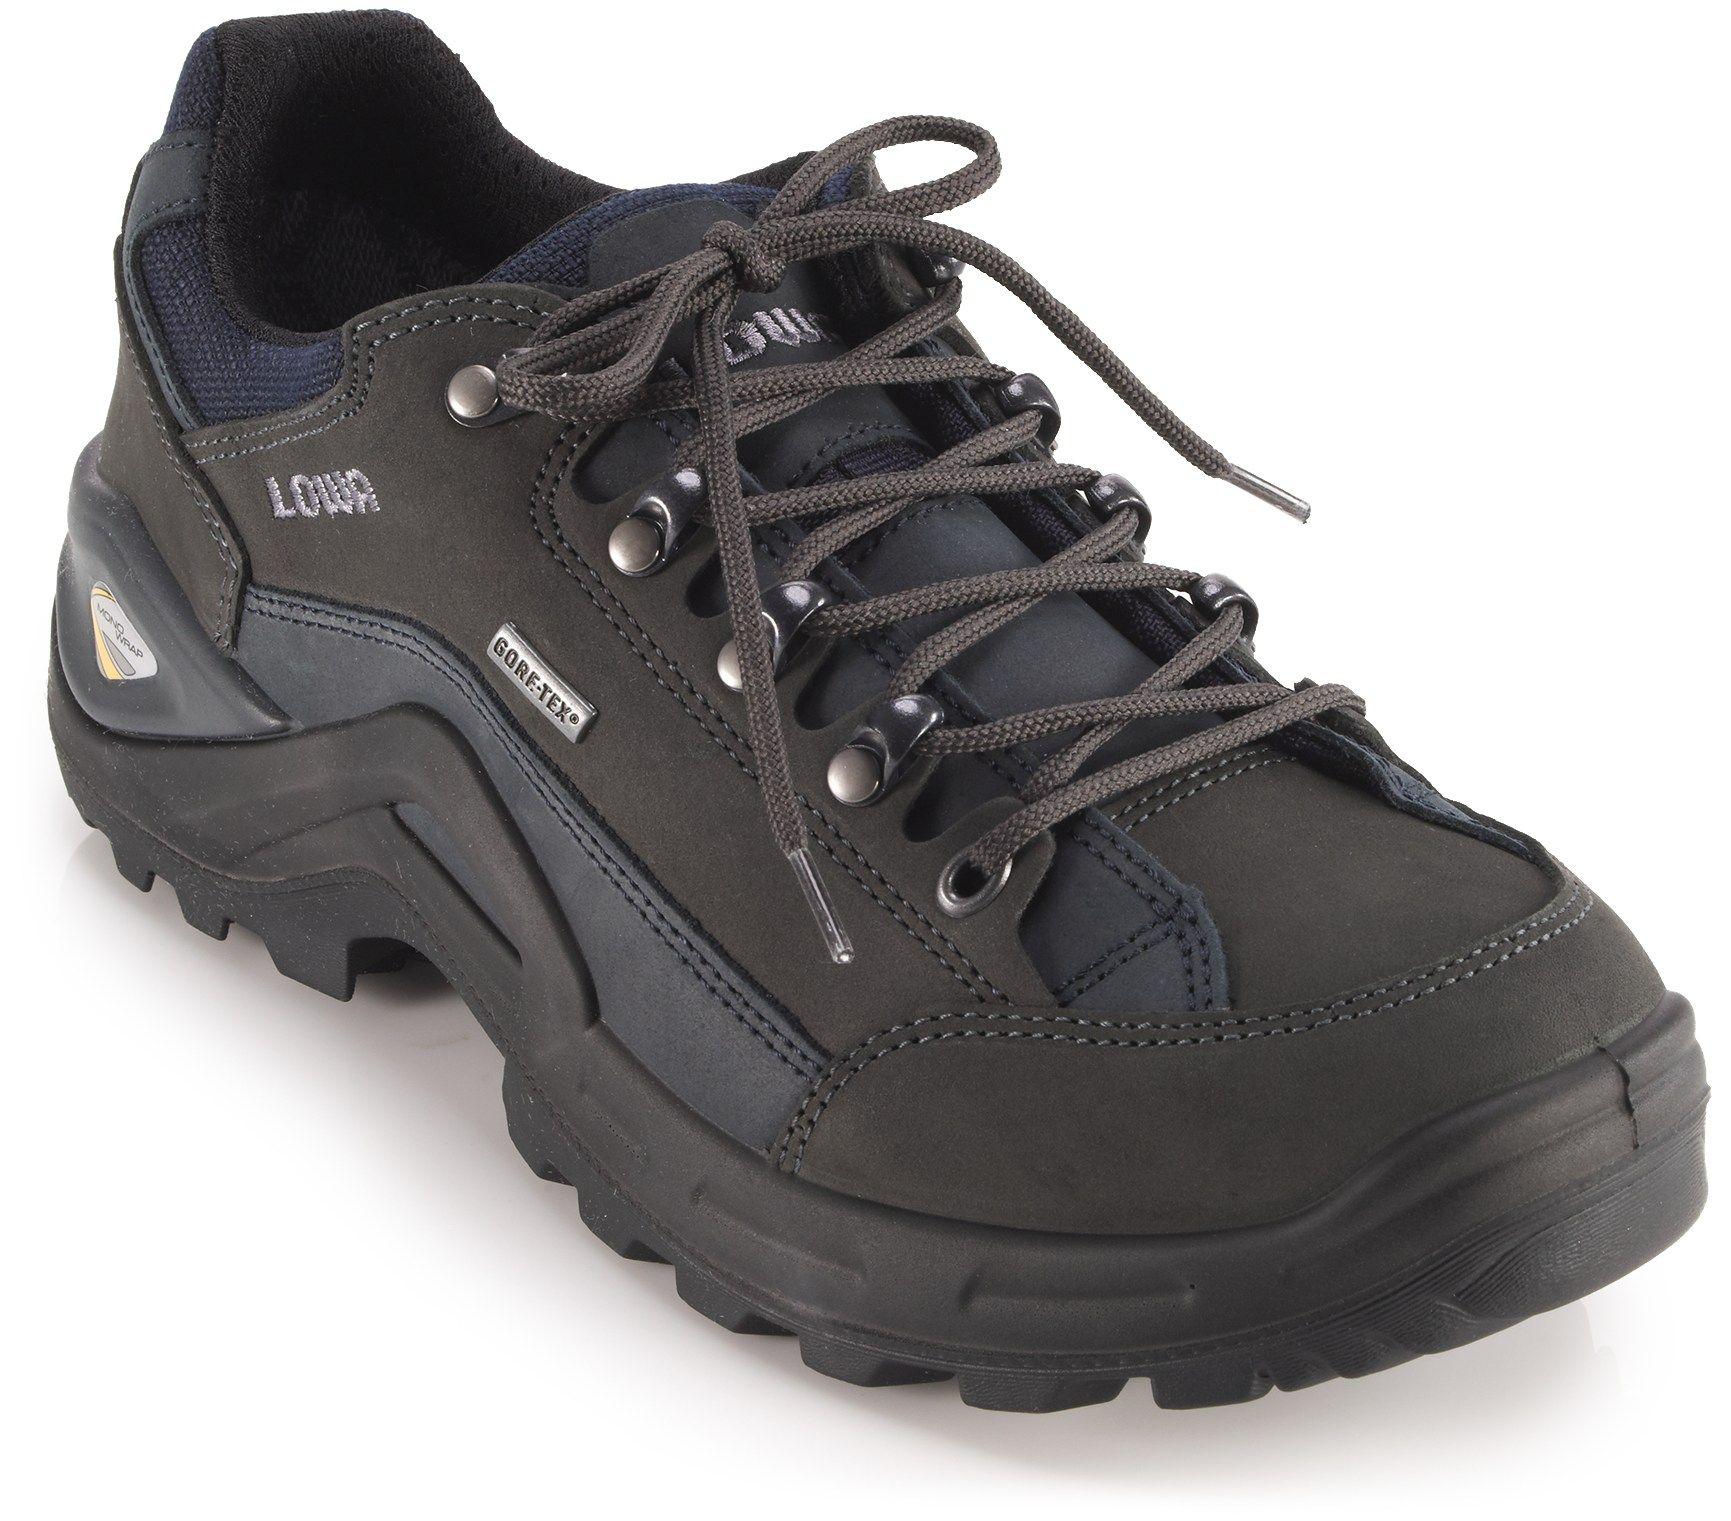 Lowa Male Renegade Ii Gtx Lo Hiking Shoes - Men's